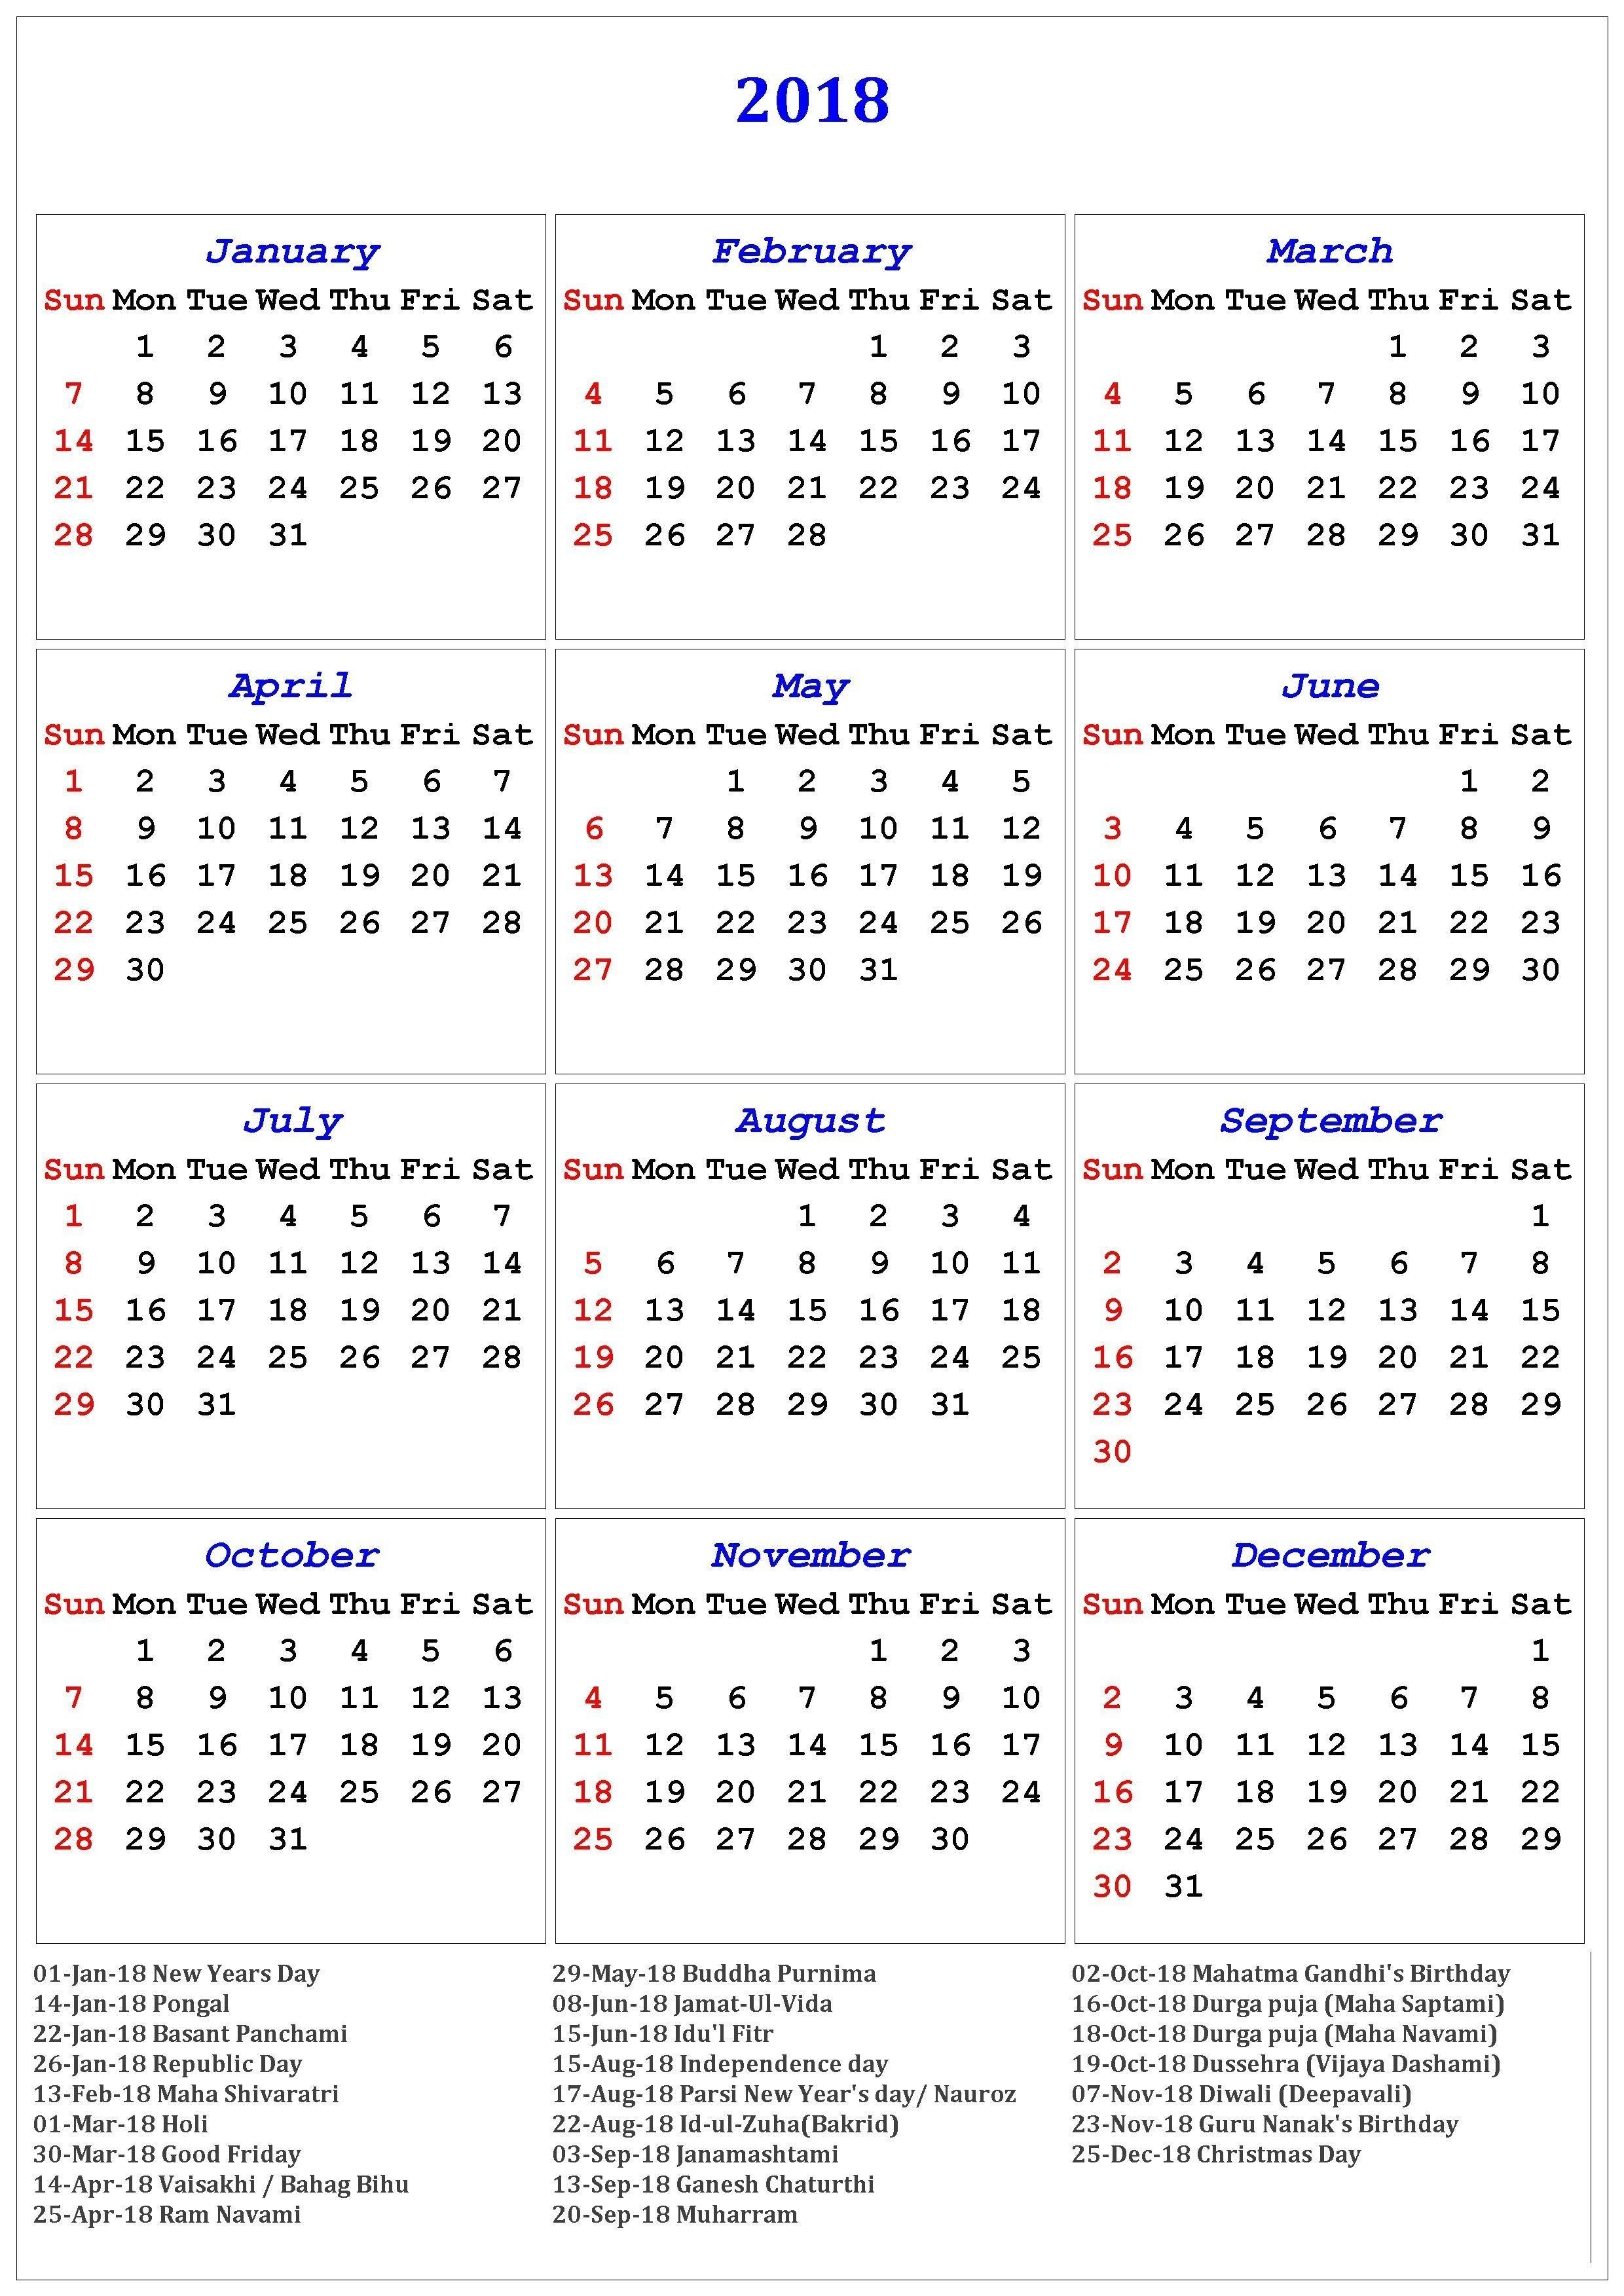 2018 Calendar Of Holidays | November Calendar | November-List Of Holidays 2020